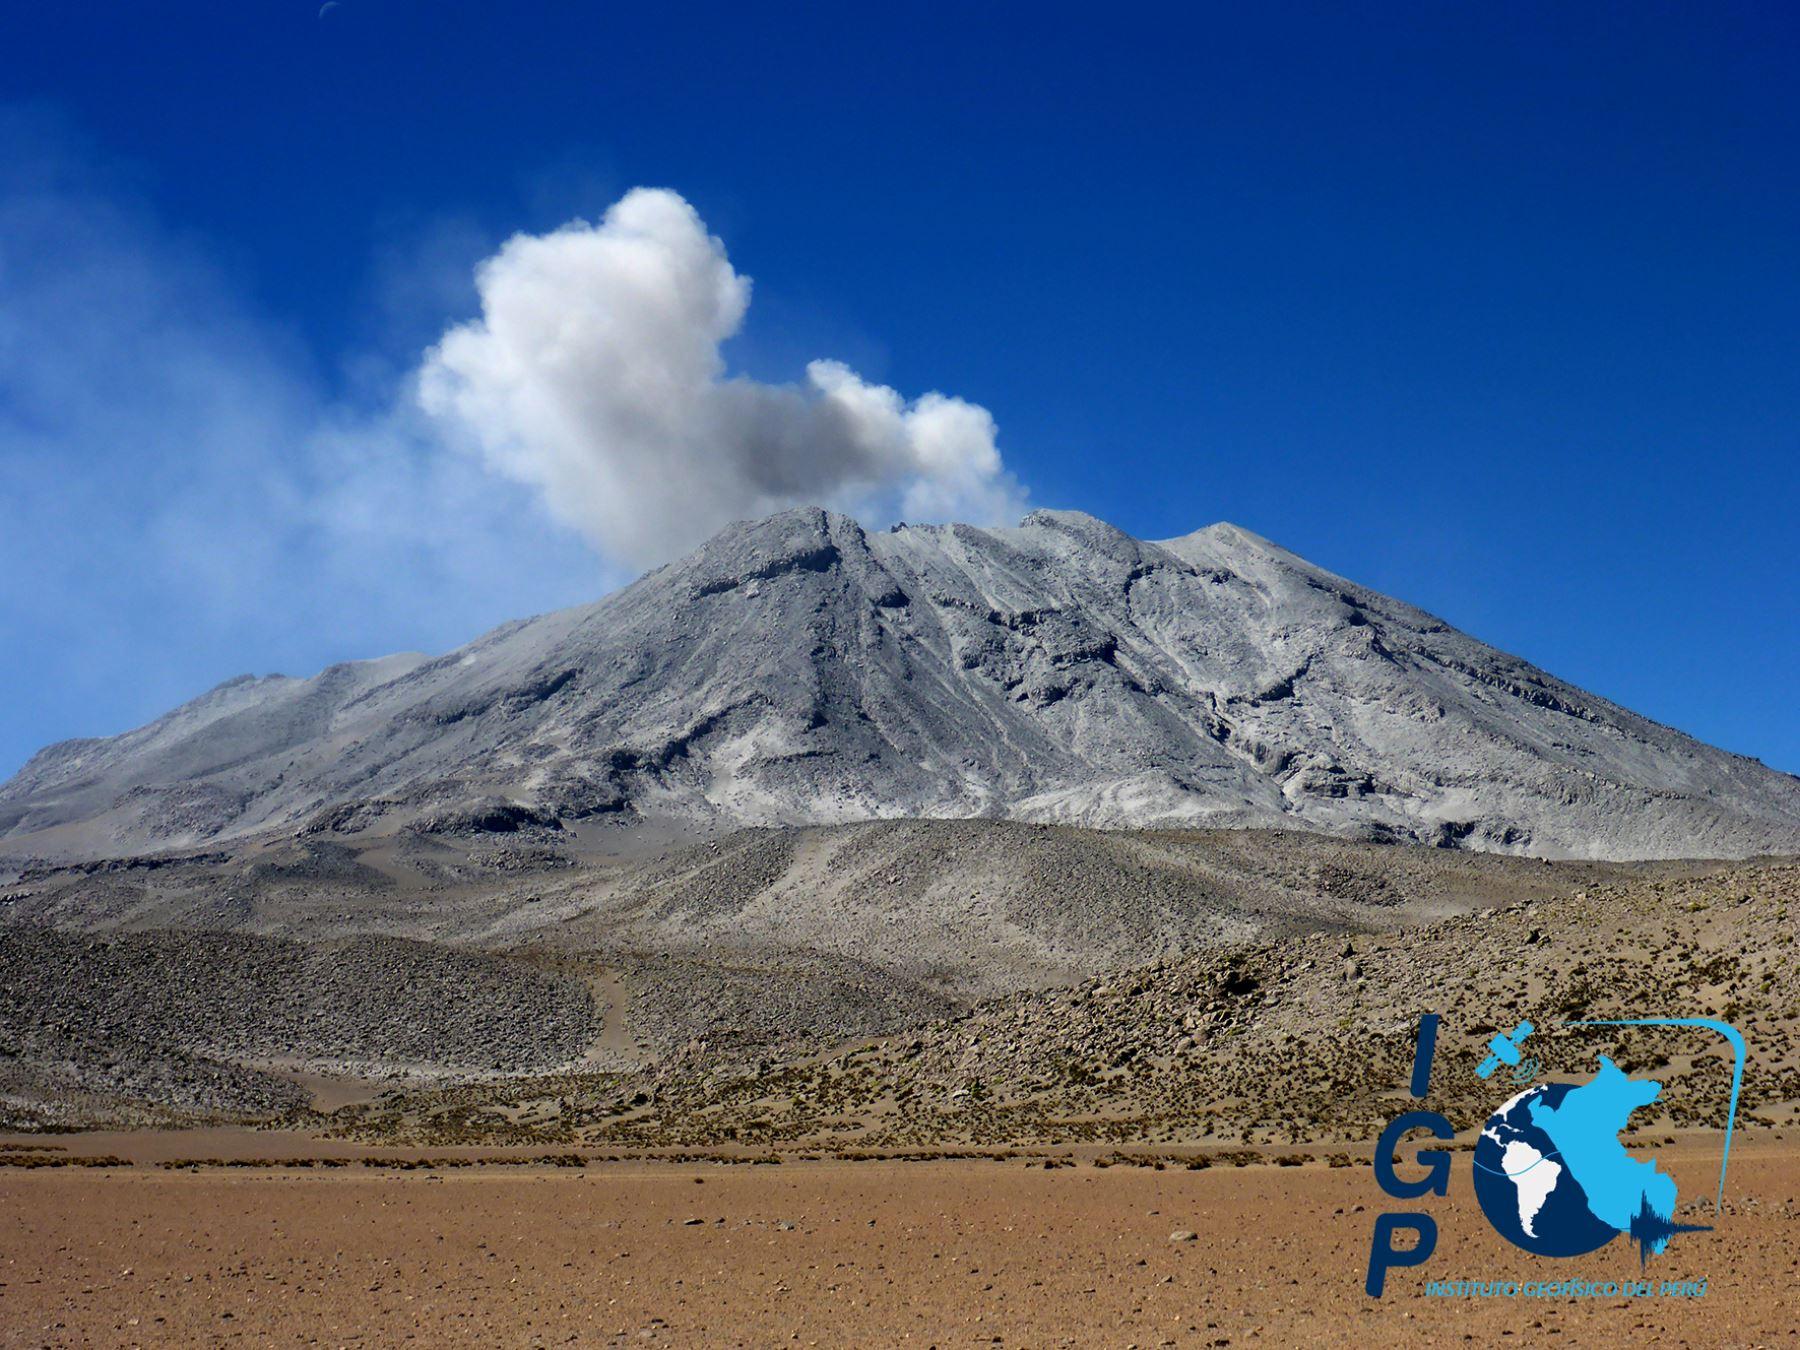 August 27, 2019. EN. Peru : Ubinas , Peru : Sabancaya , Indonesia : Anak Krakatau , Guatemala : Fuego .